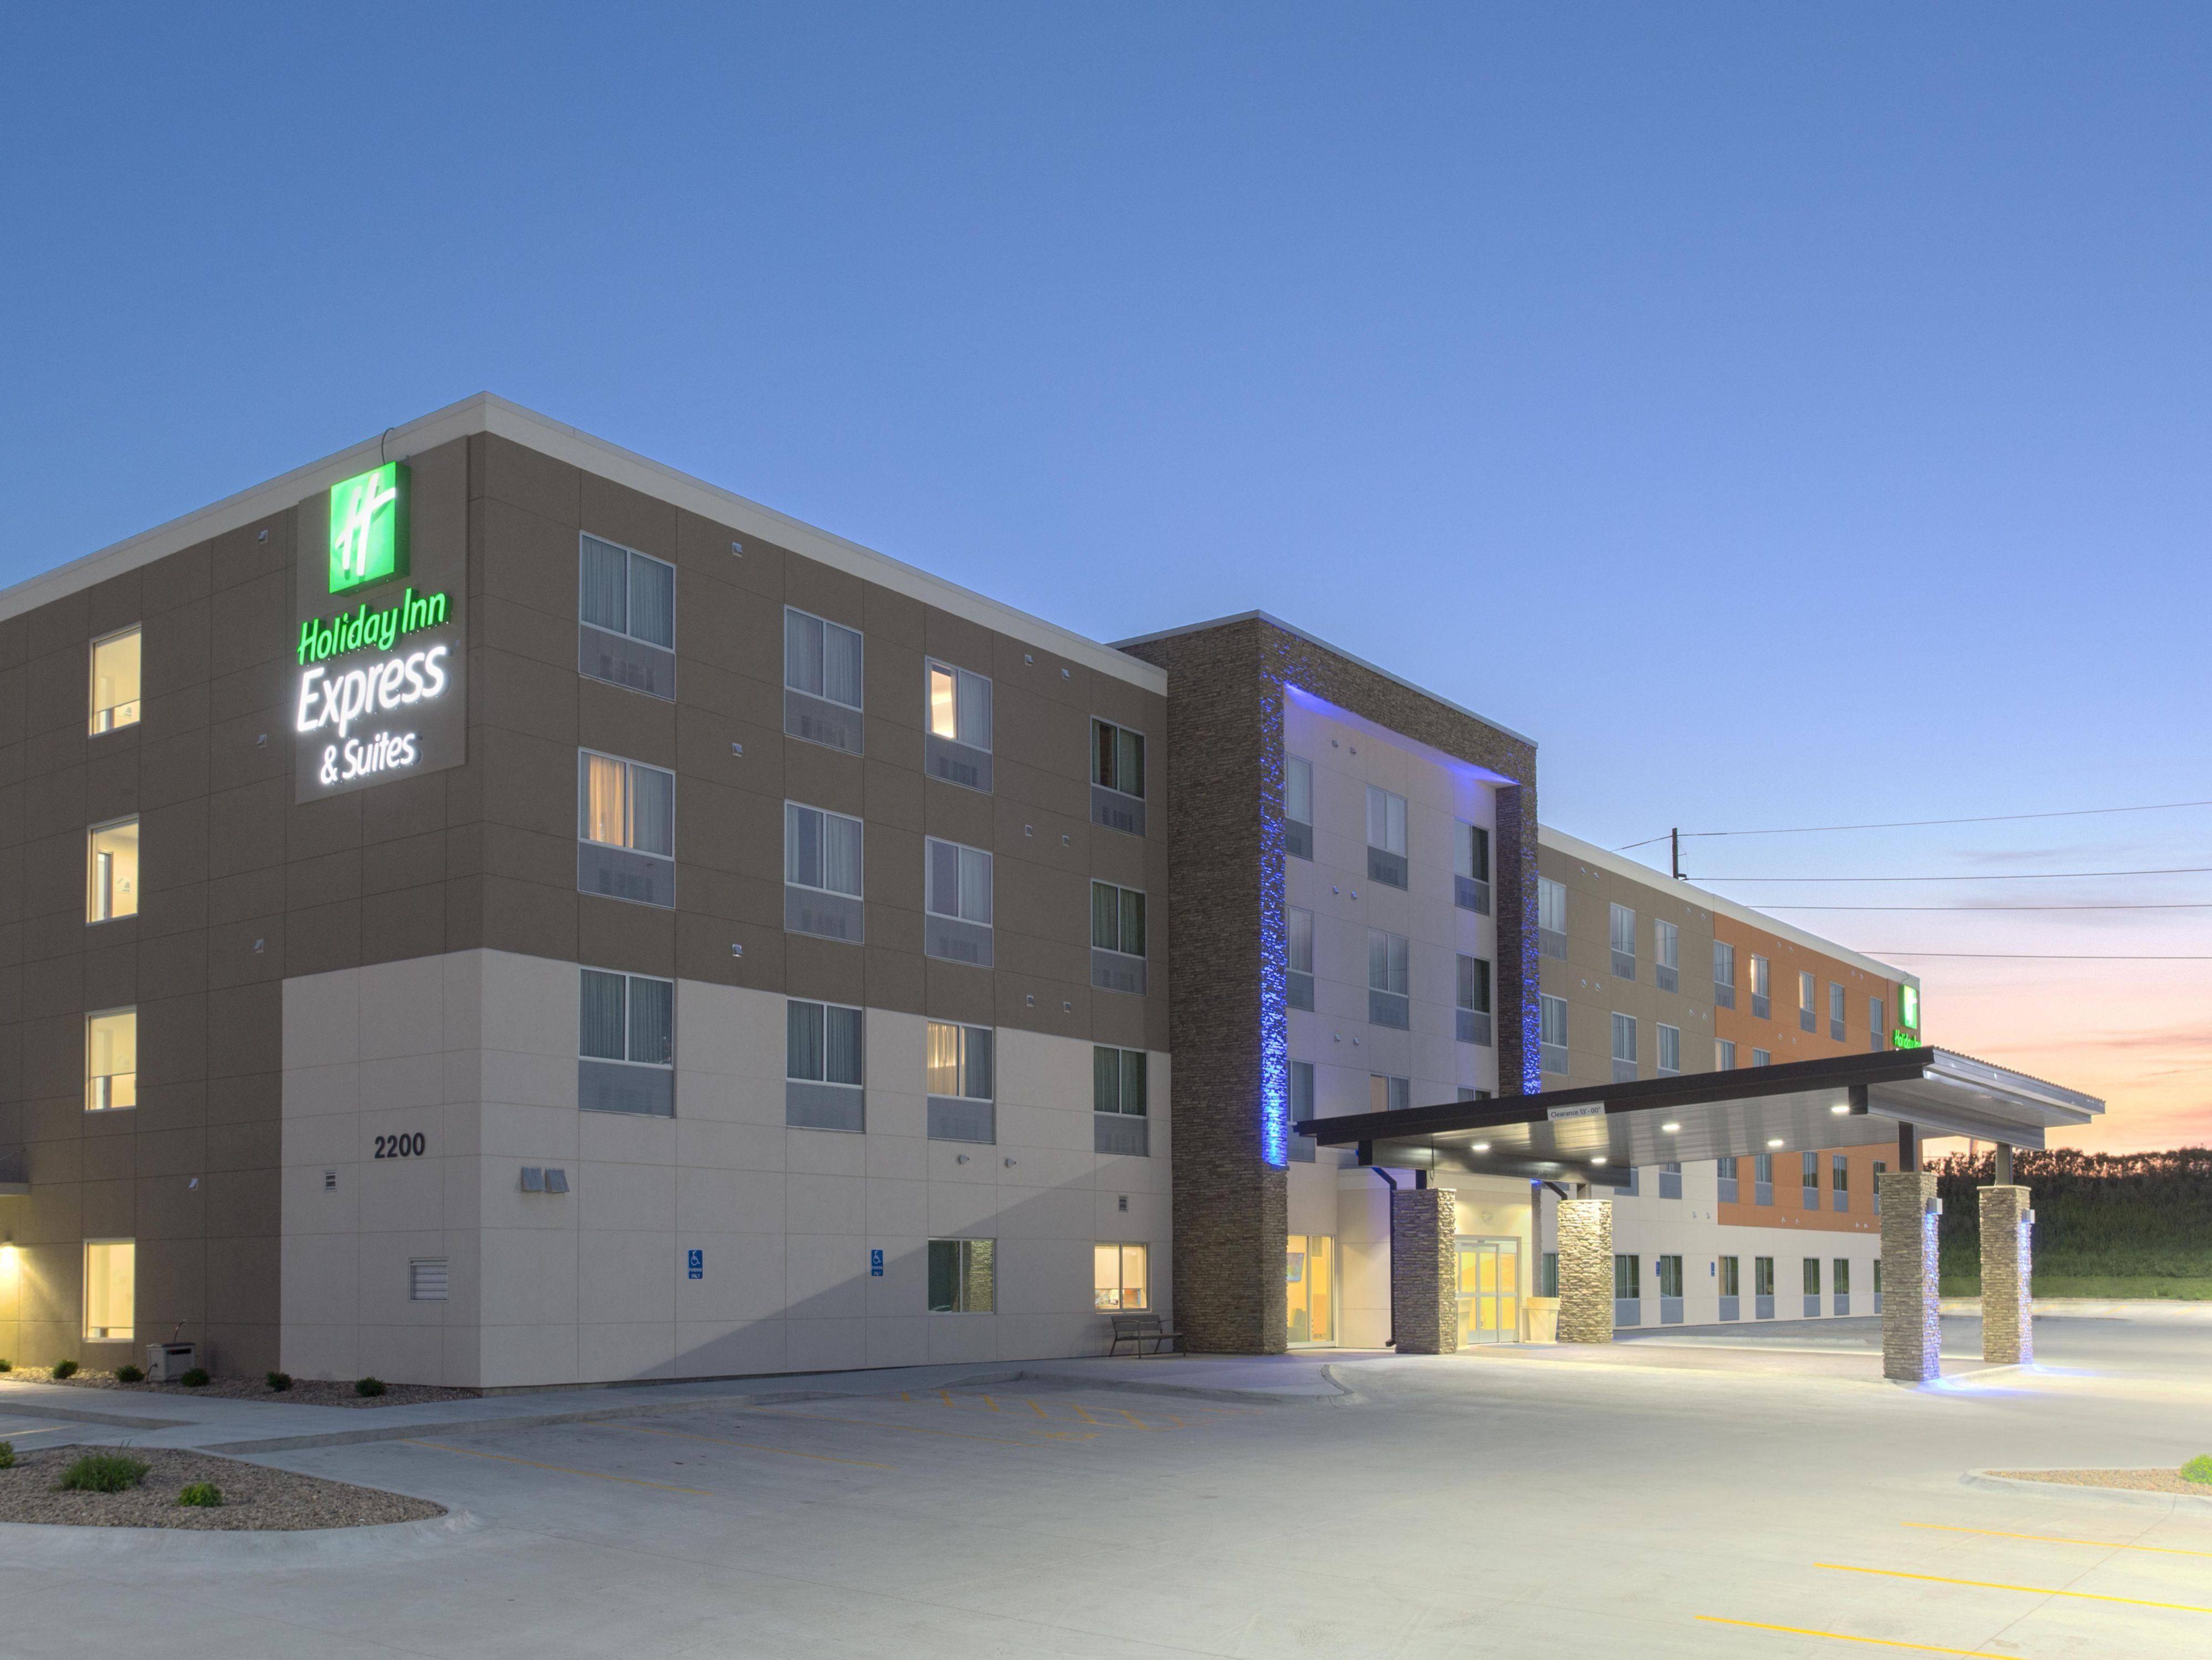 hotel nebraska omaha staybridge hoteldetail hotels omads and en suites ne in dodge extended us stay lincoln